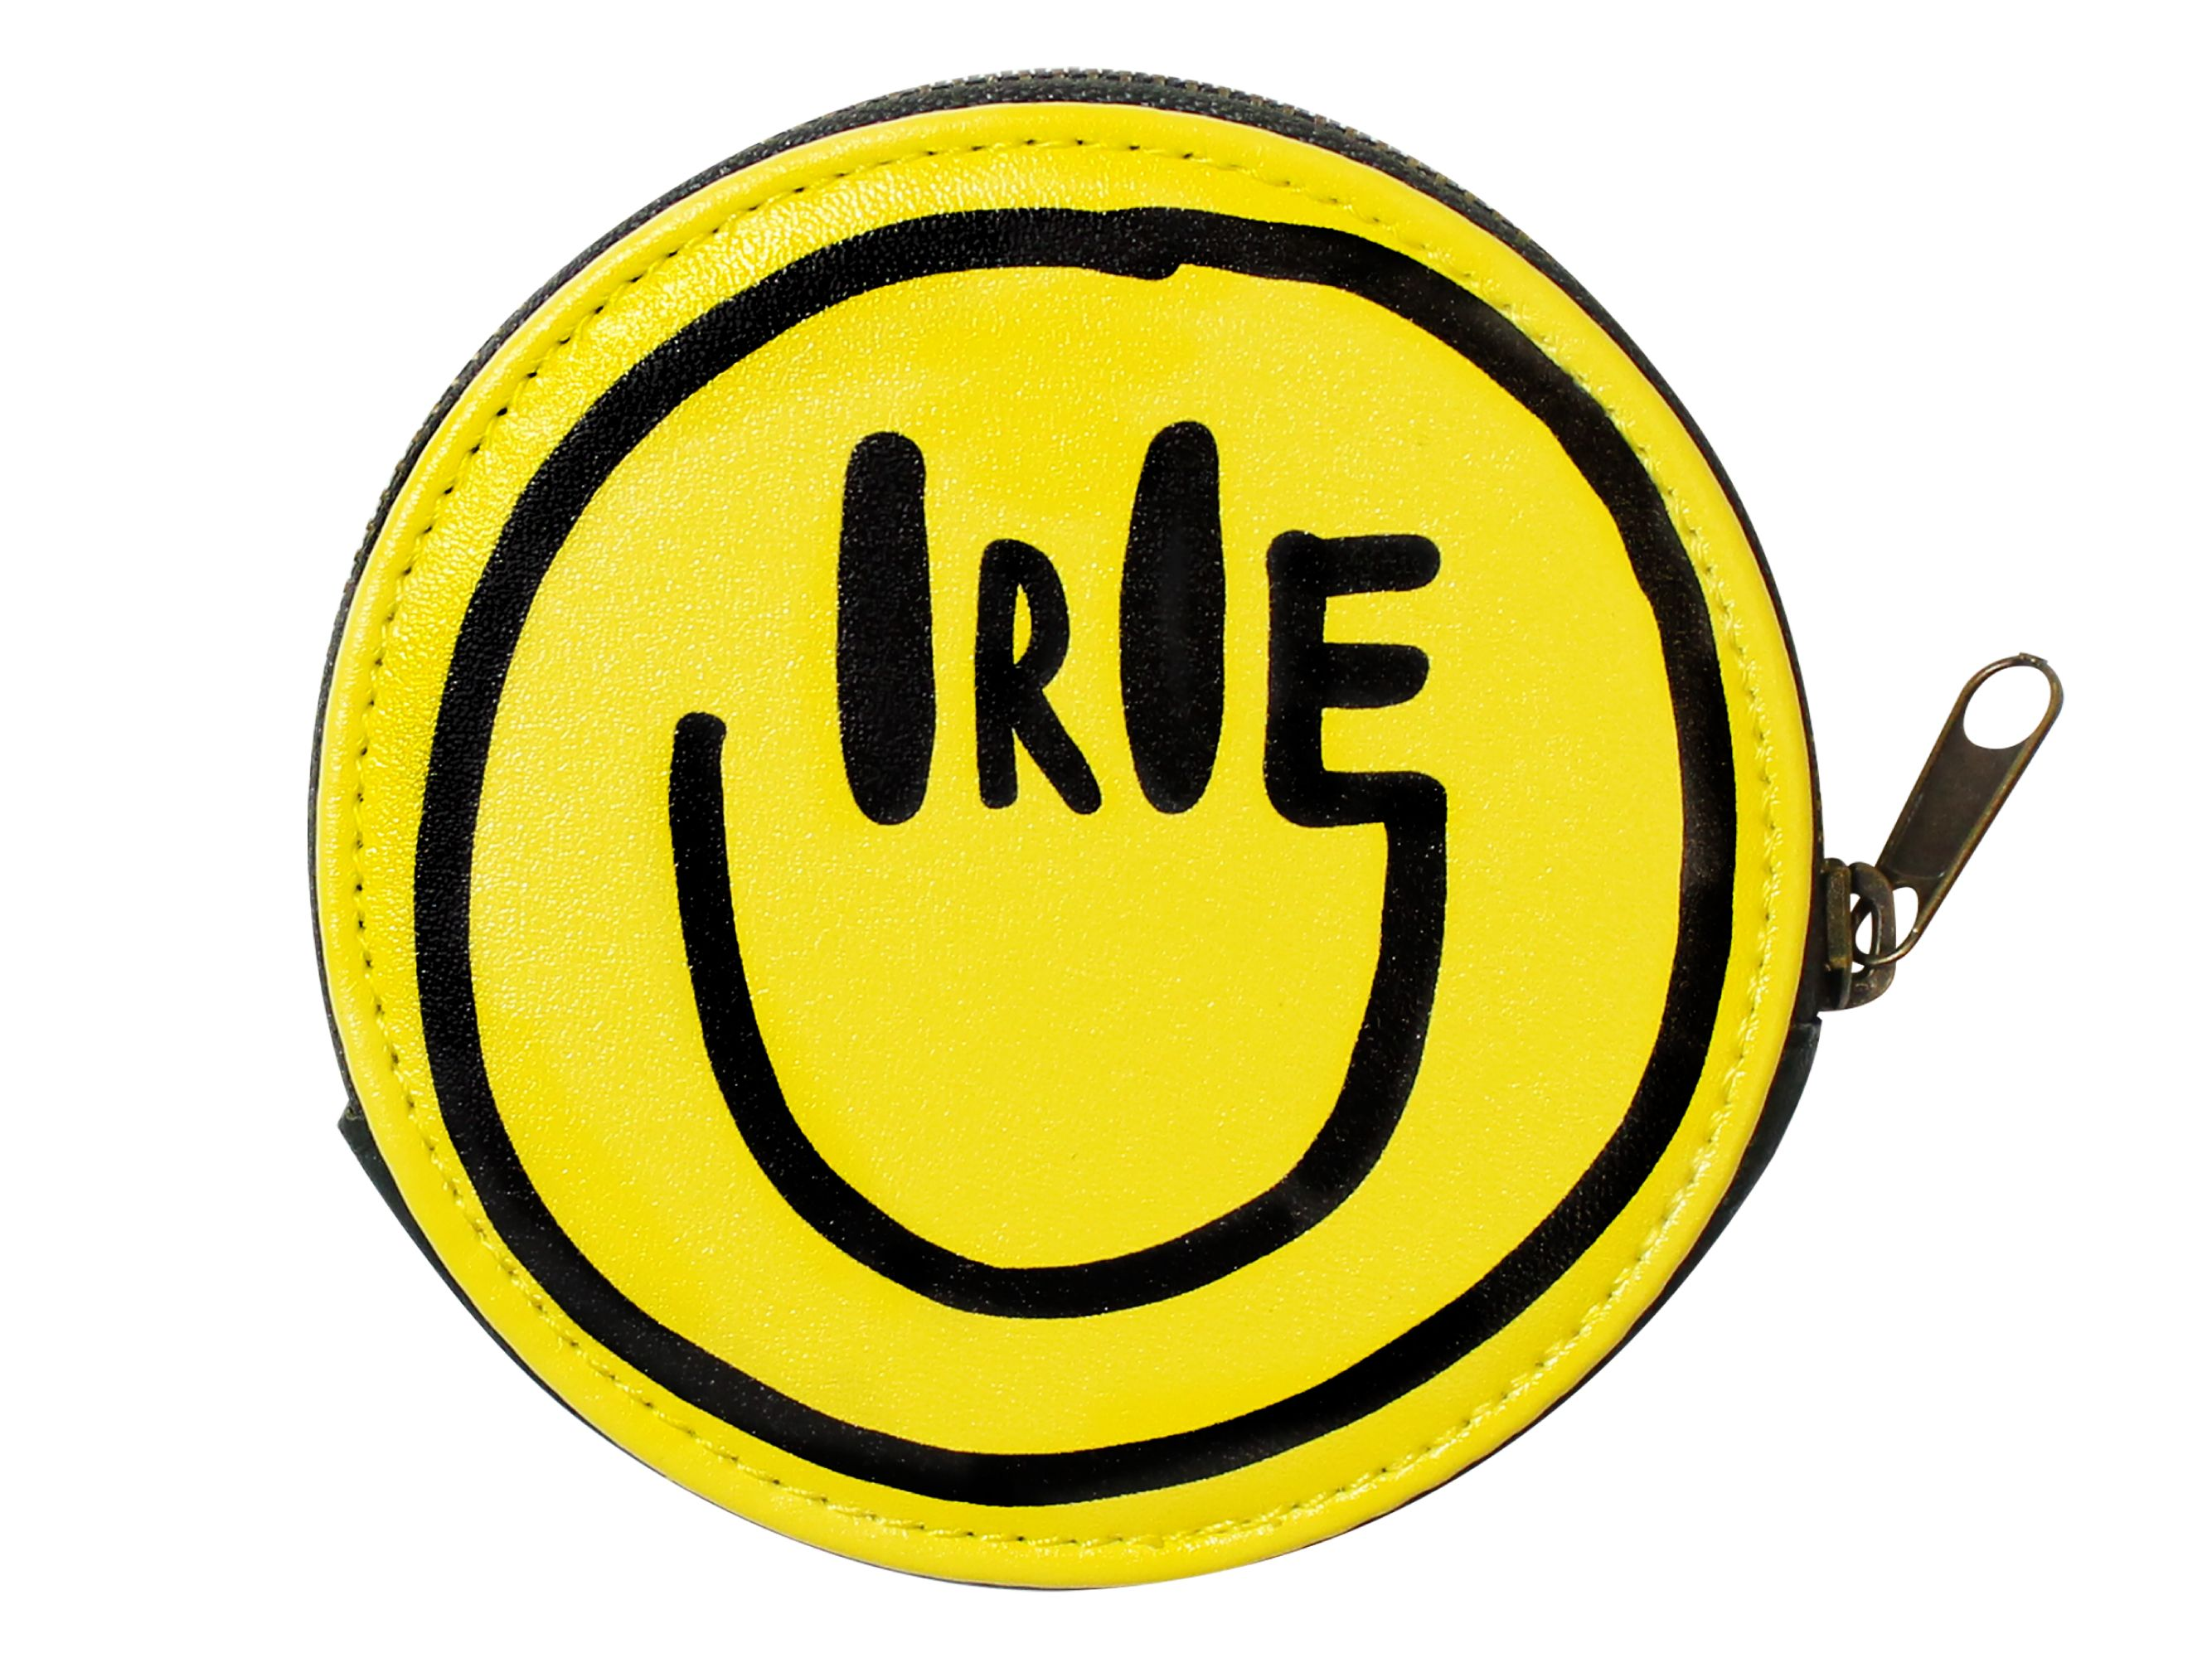 【50%OFF】SMIRIE COIN CASE -IRIEby irielife-